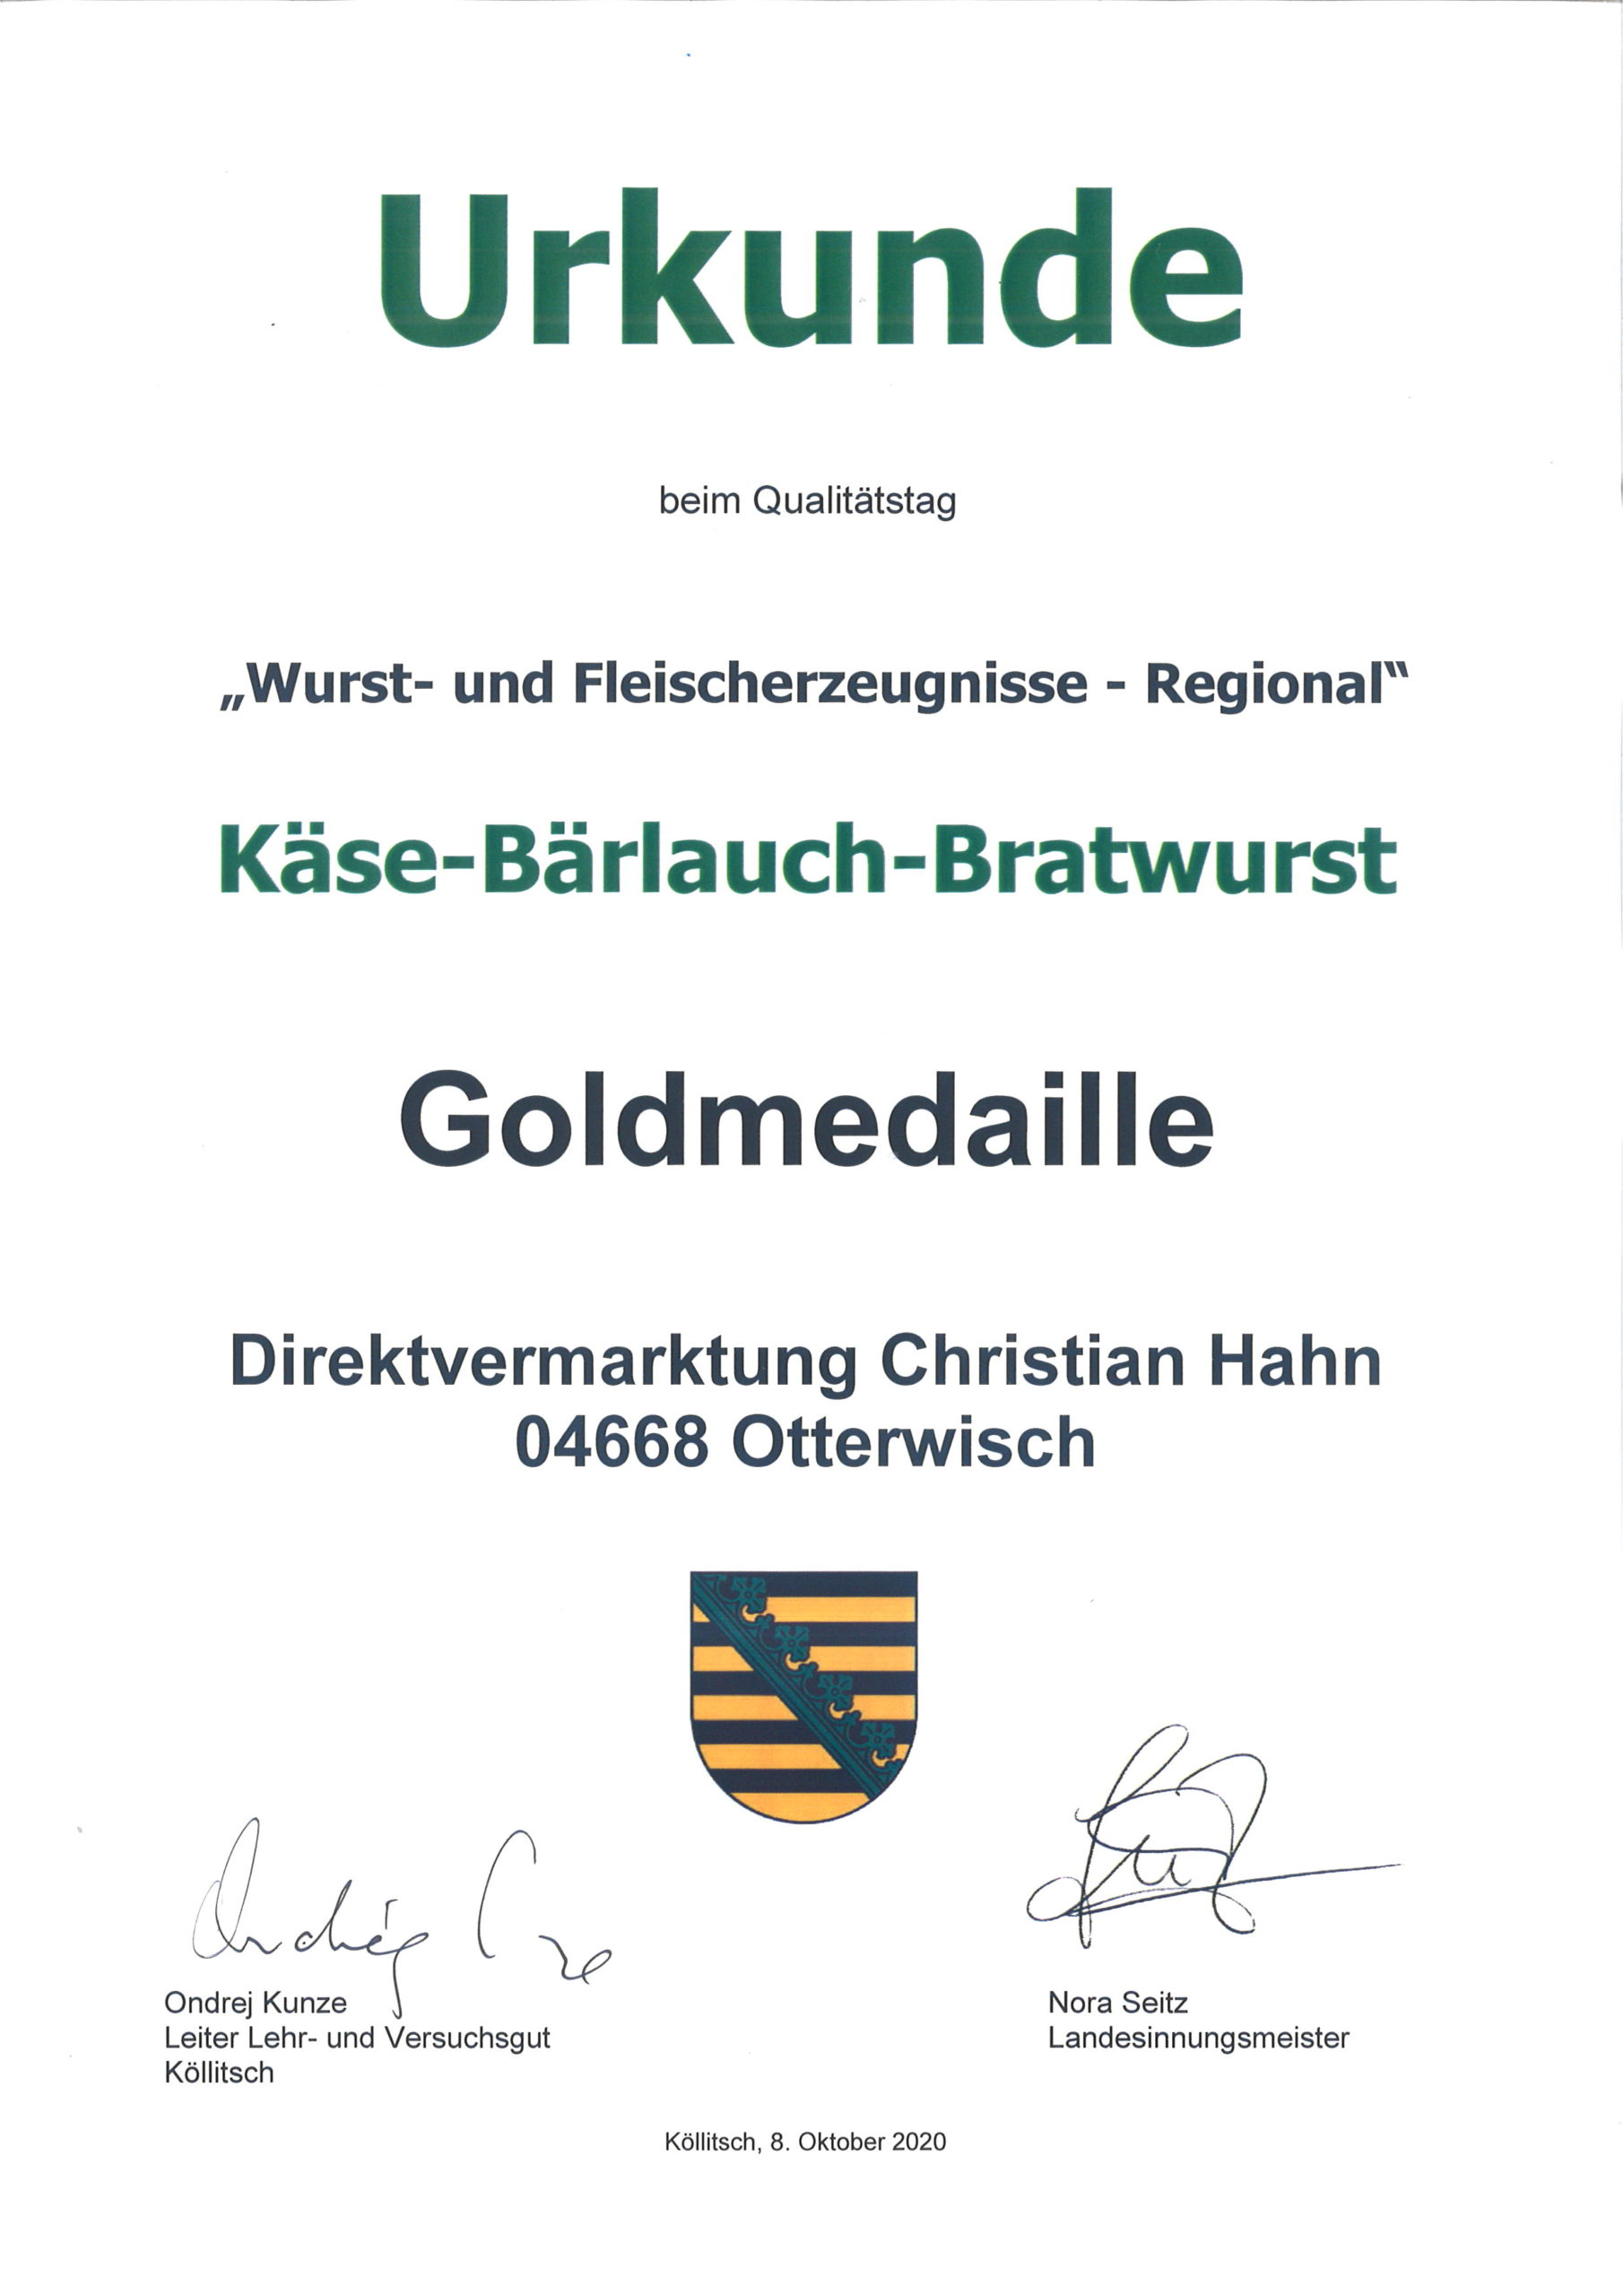 Käse-Bärlauch-Bratwurst Goldmedallie